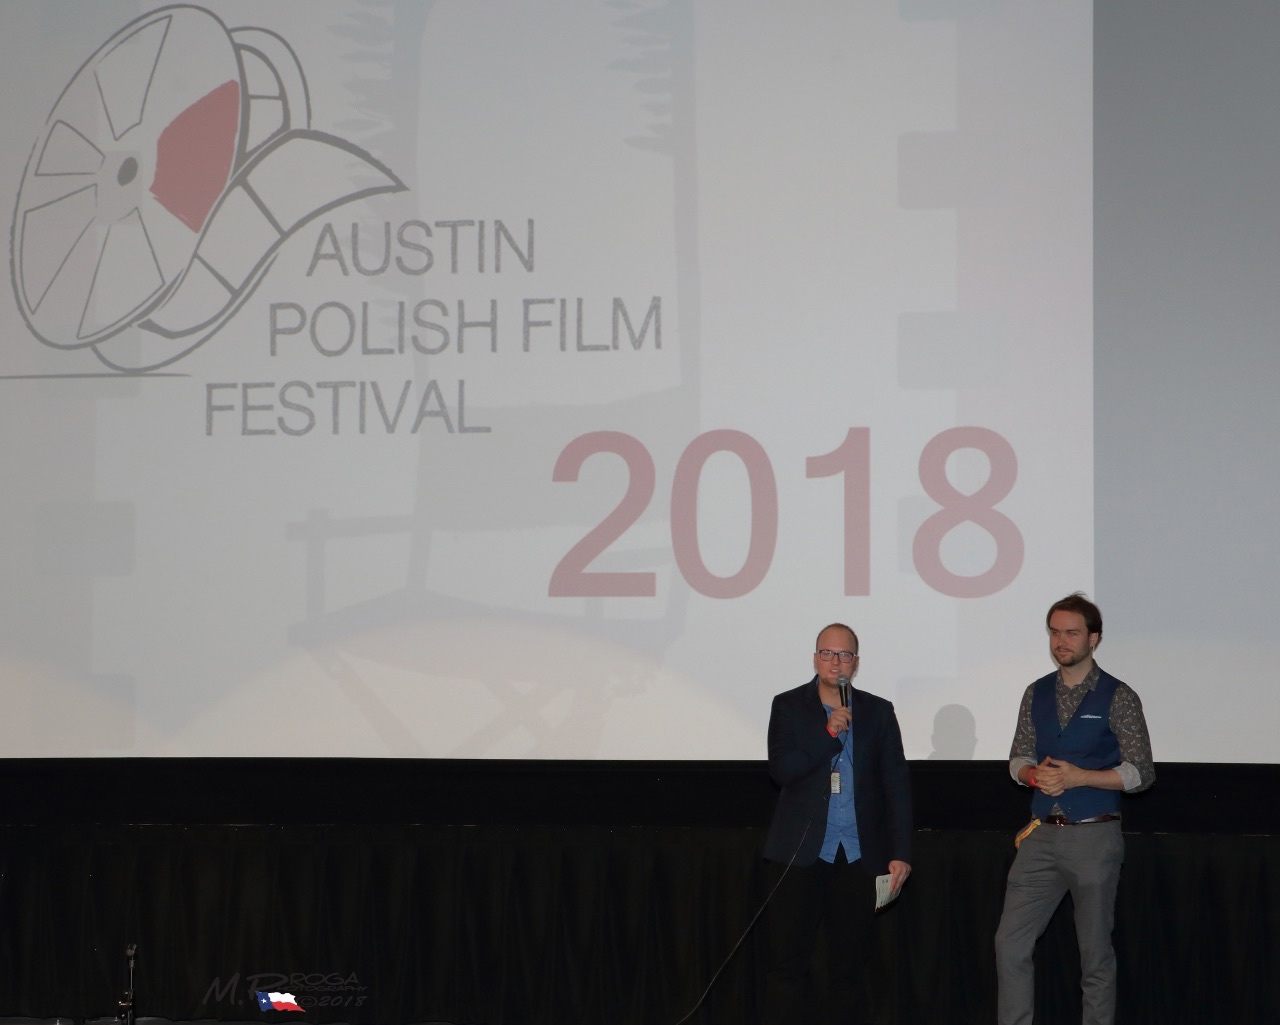 Sebastian Smolinski and Alex Pietrzak